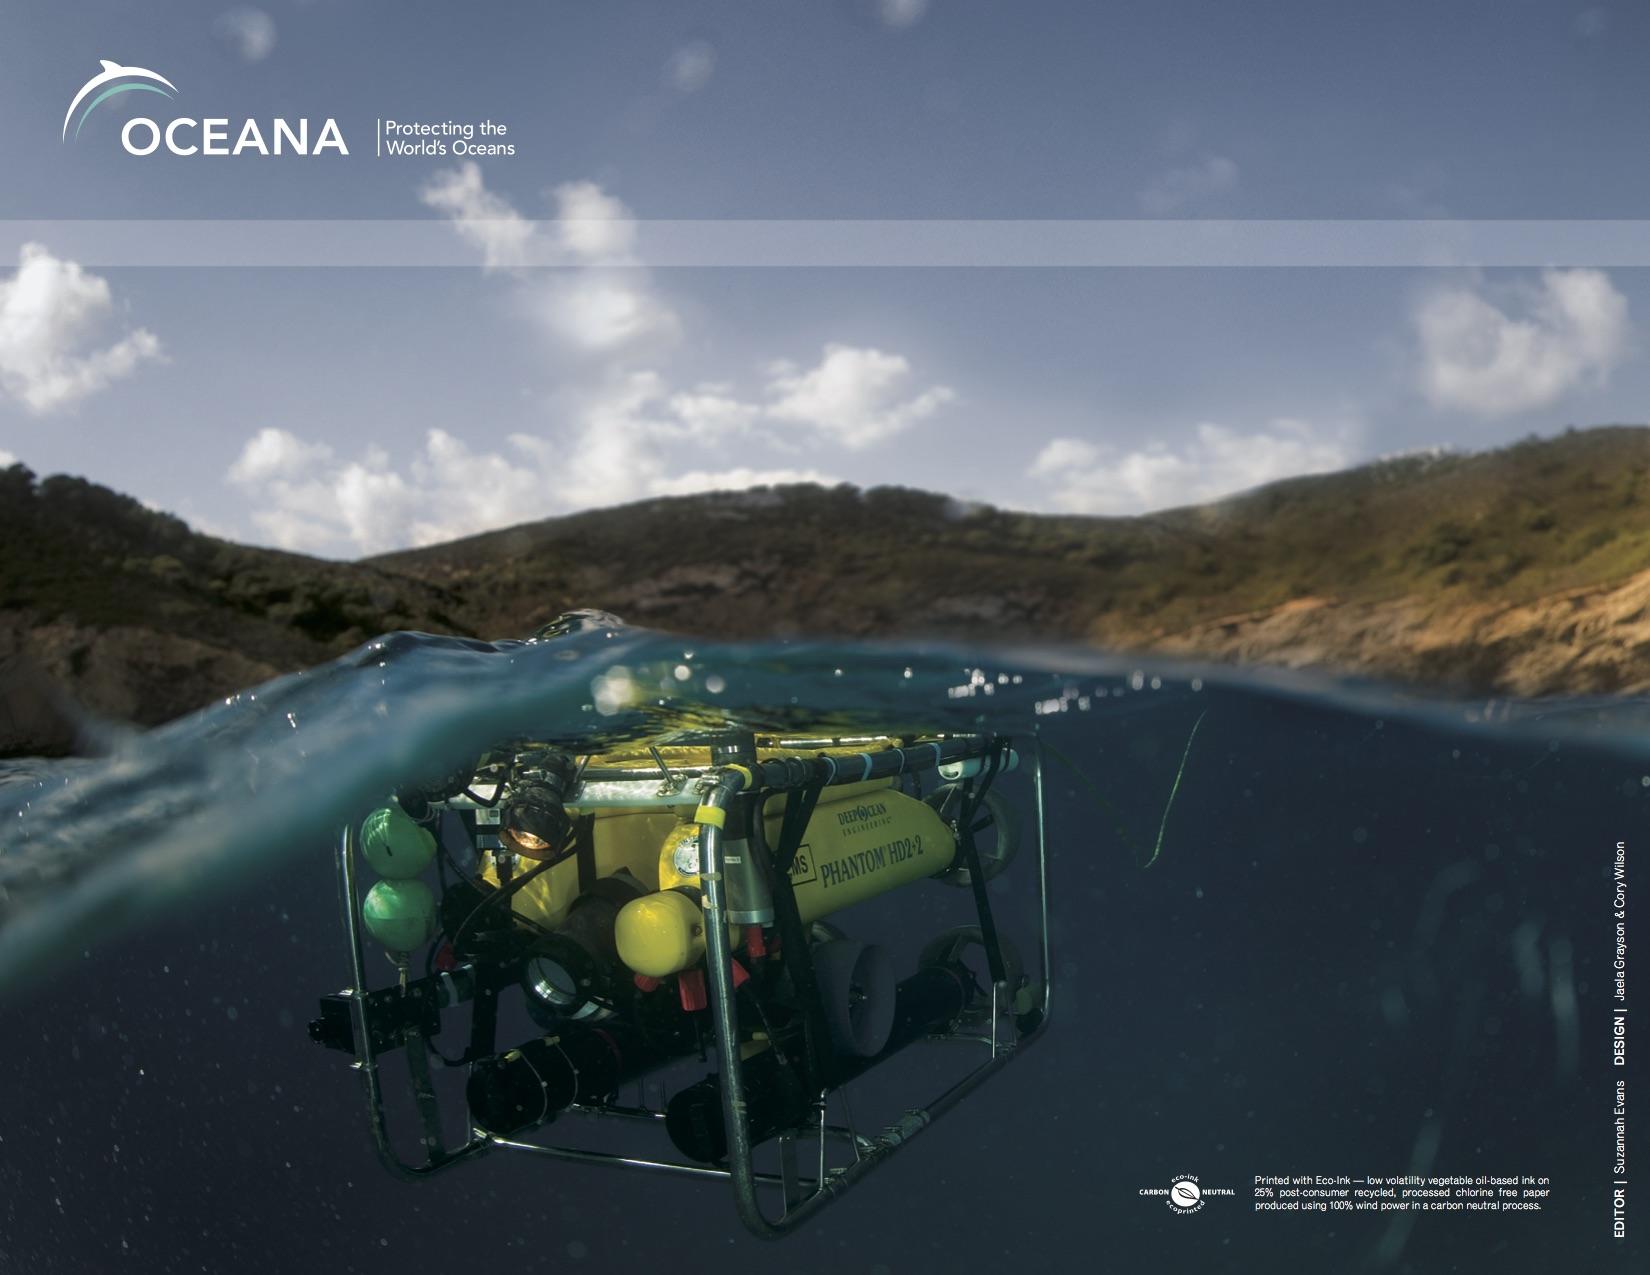 Oceana_annual_report07_FINAL13.jpg